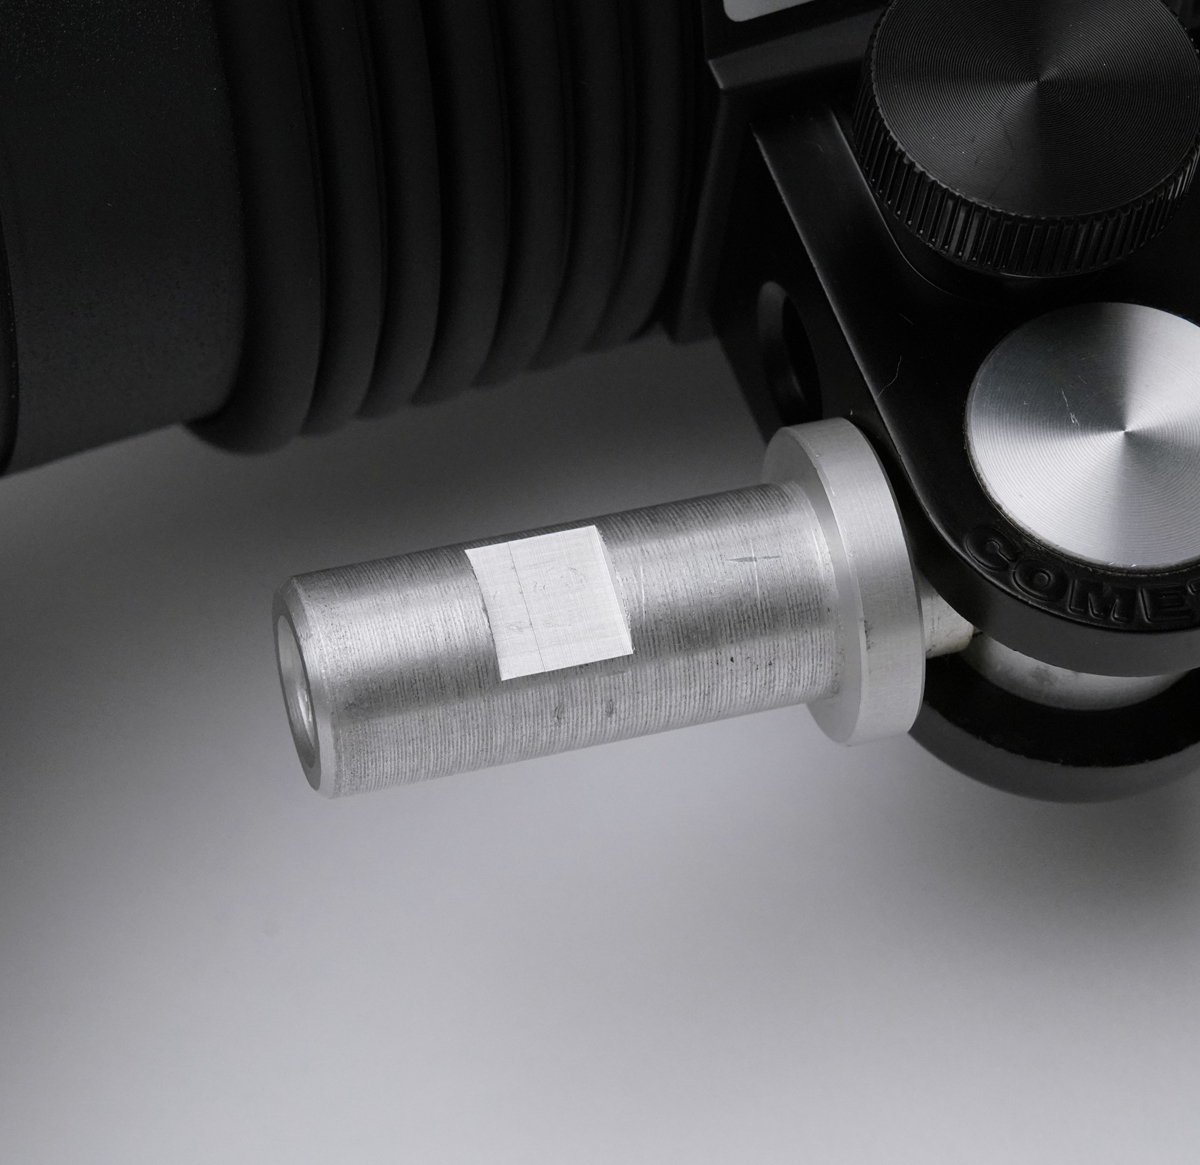 COMET コメット TWINKLE 04F III + CX-Cリフレクター テスト発光のみ美品_画像6